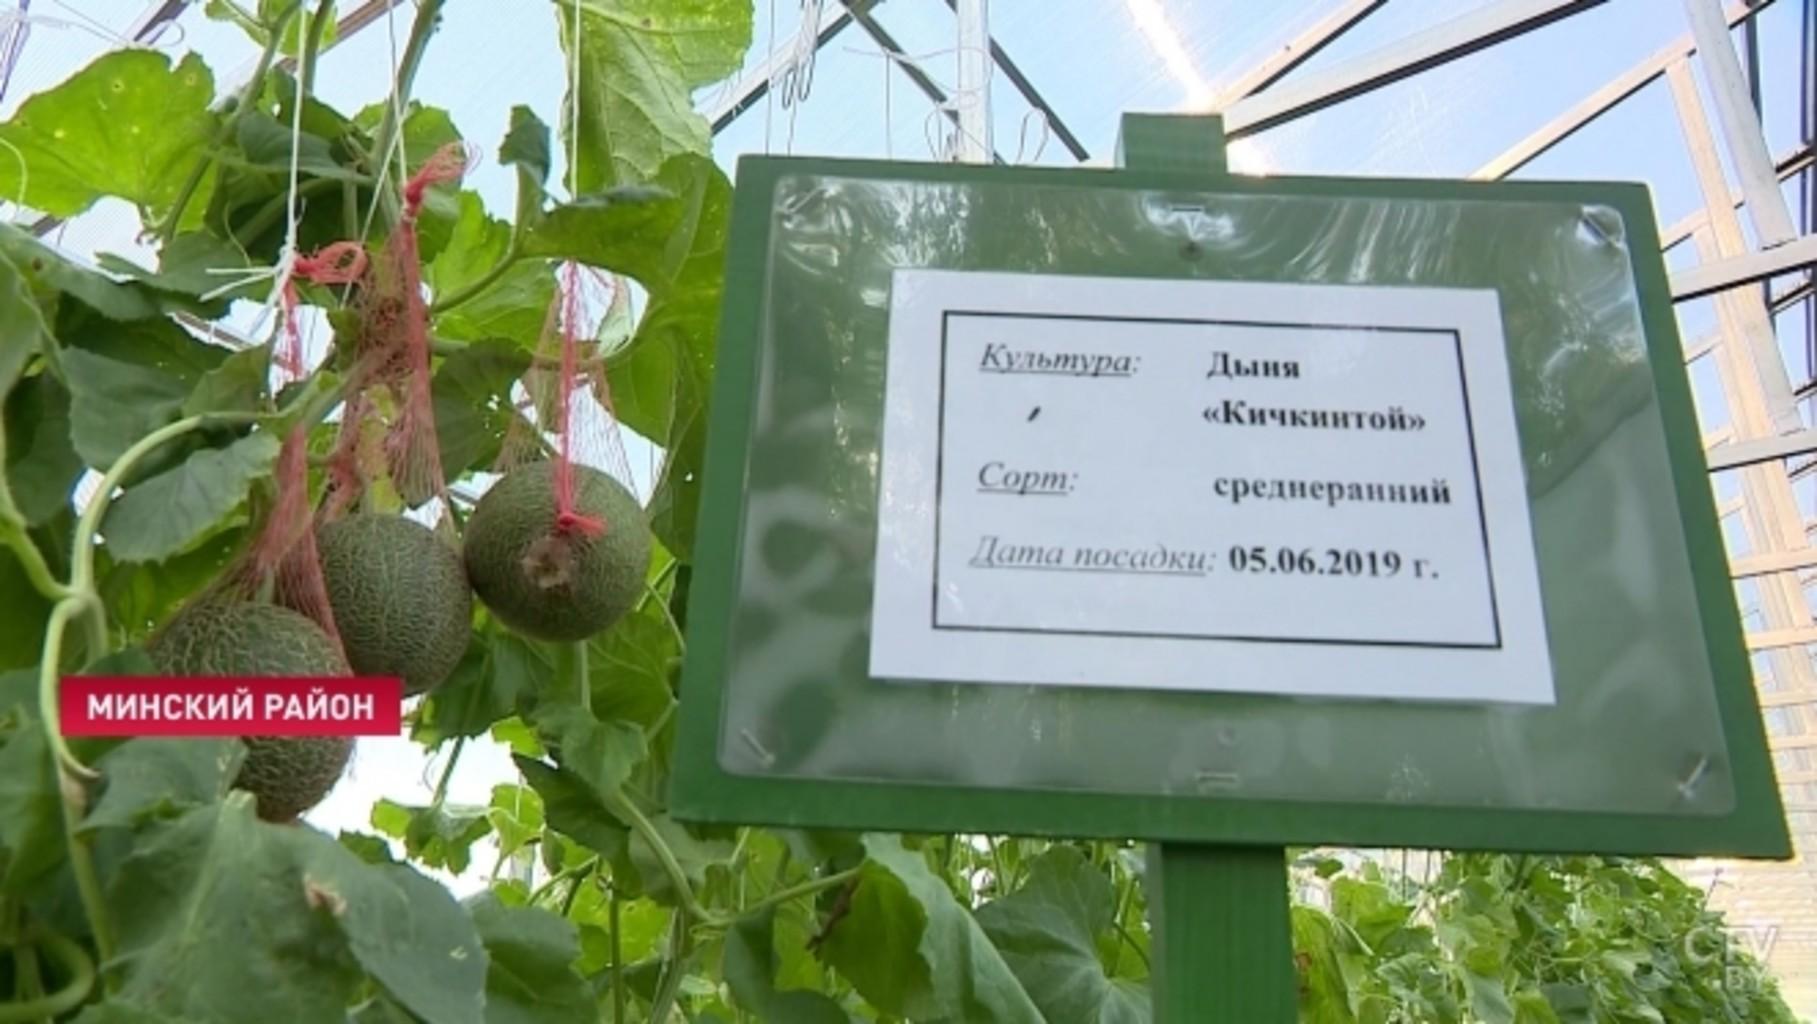 1569252730 prezidentskoe podvore aleksandr lukashenko 23 09 5